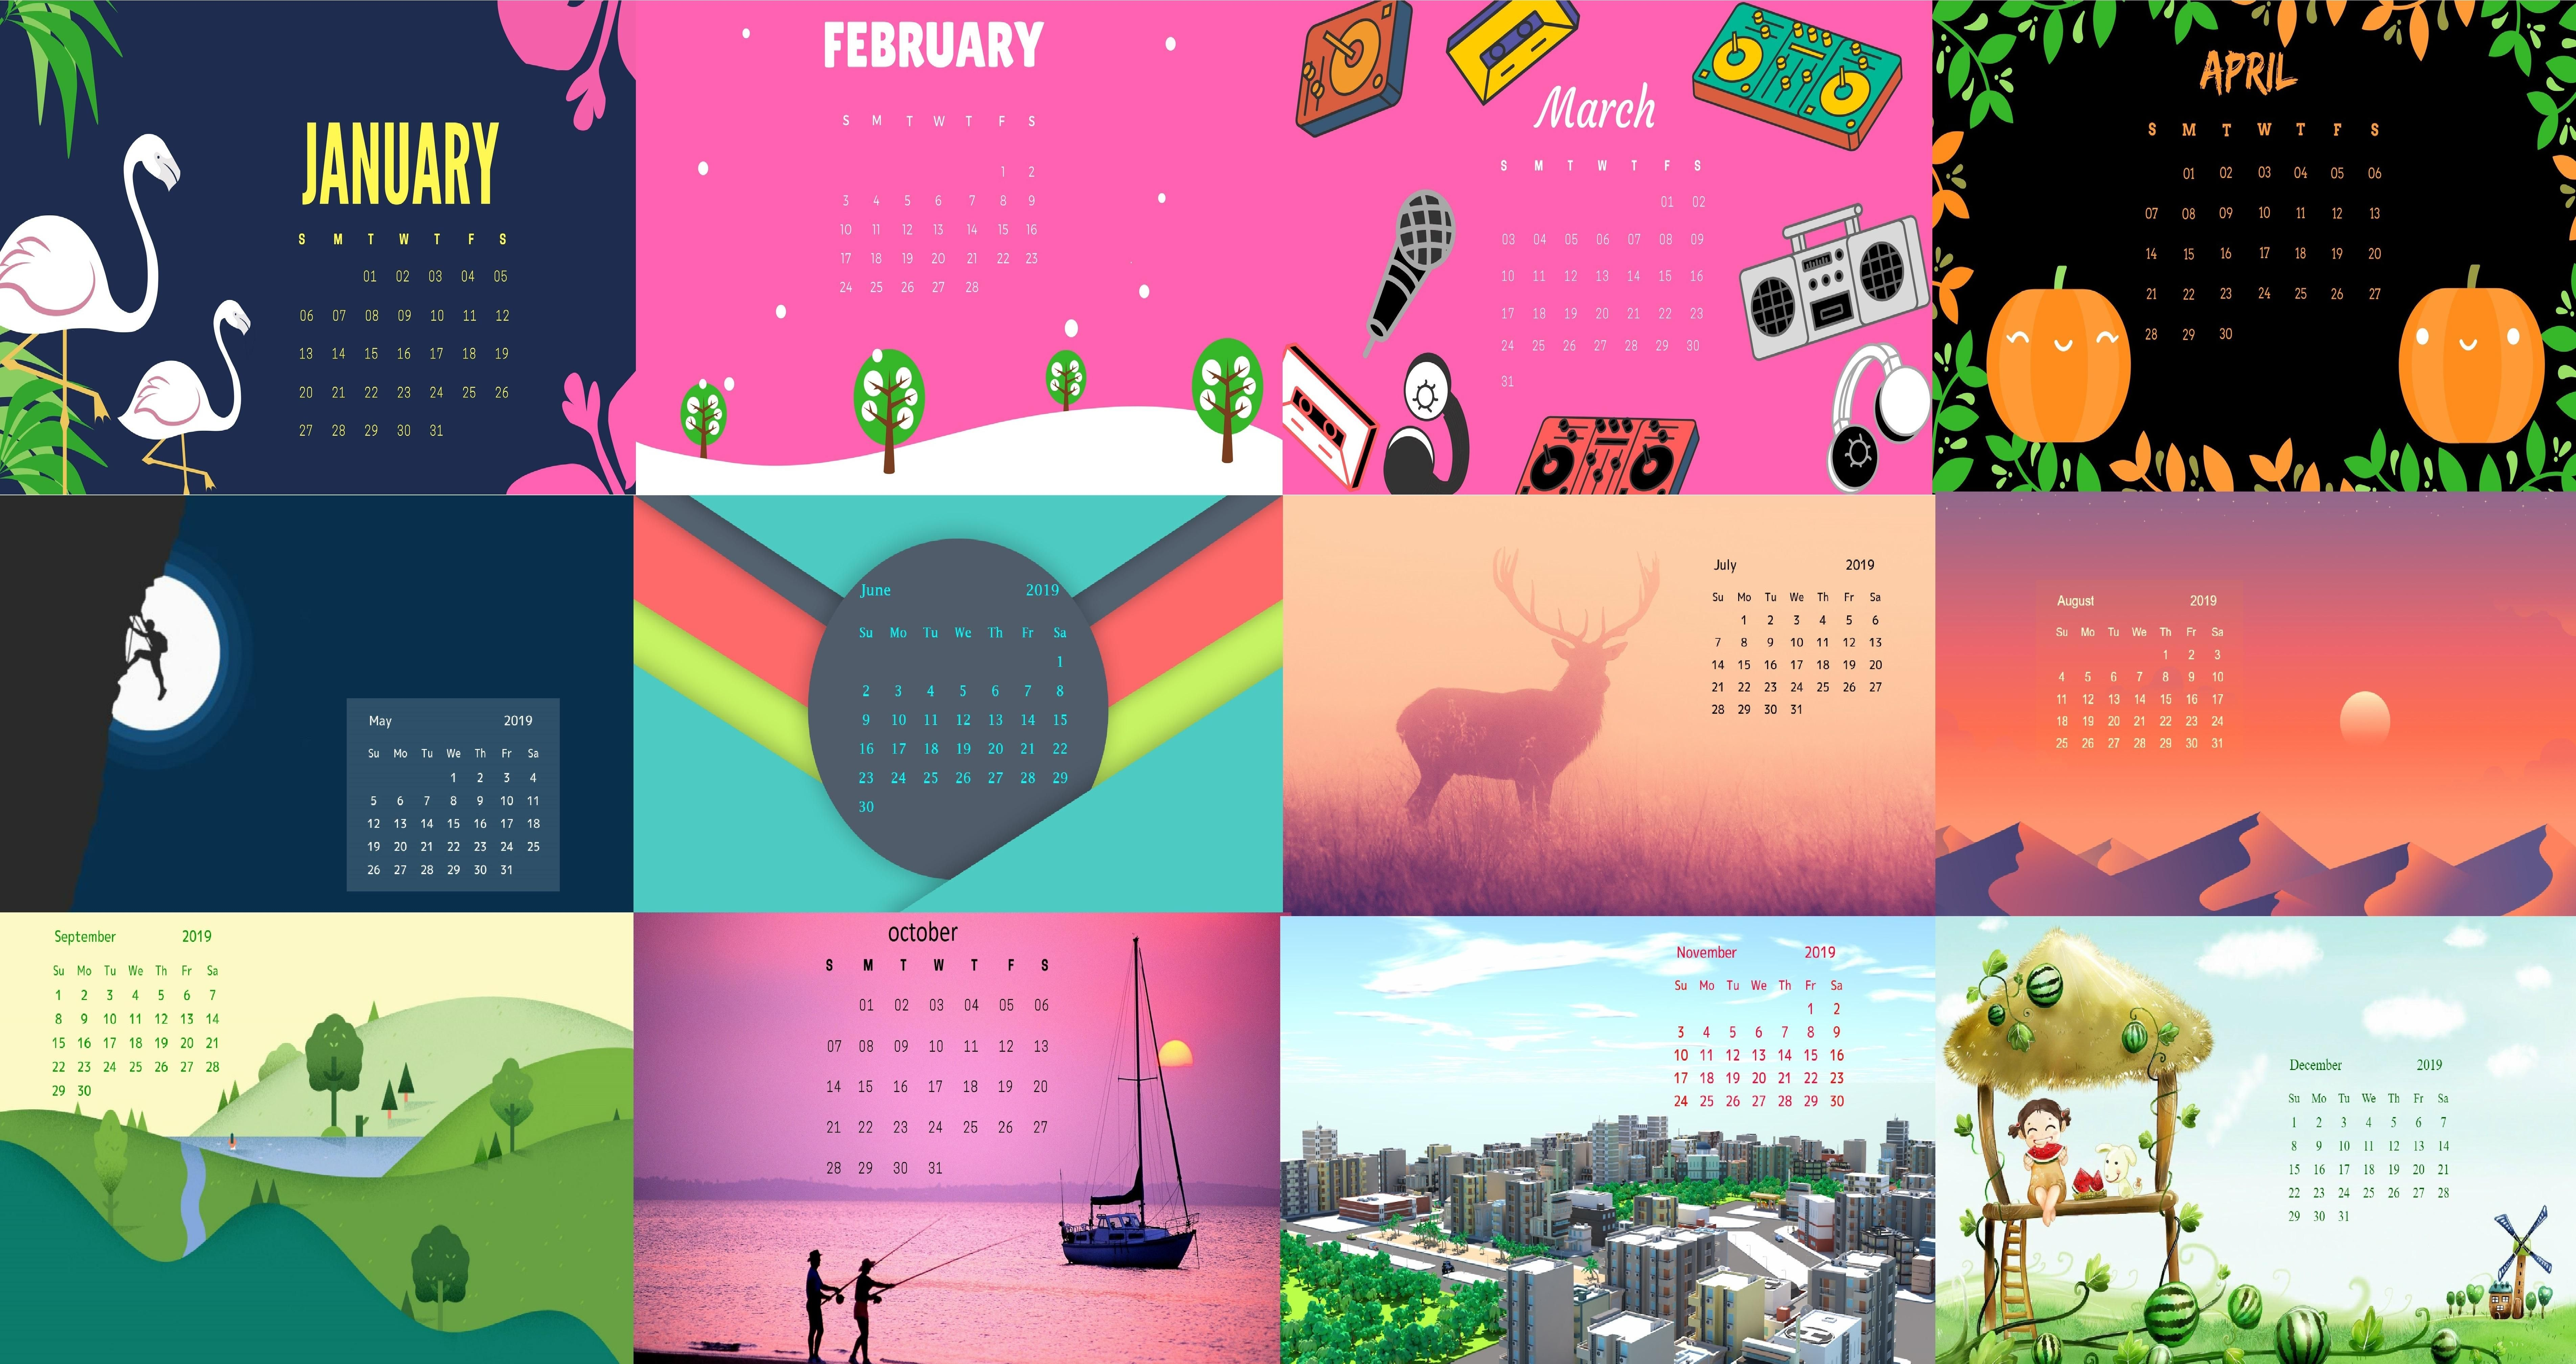 Free 2019 Calendar Hd Wallpapers Download Hd Wallpaper Calendar